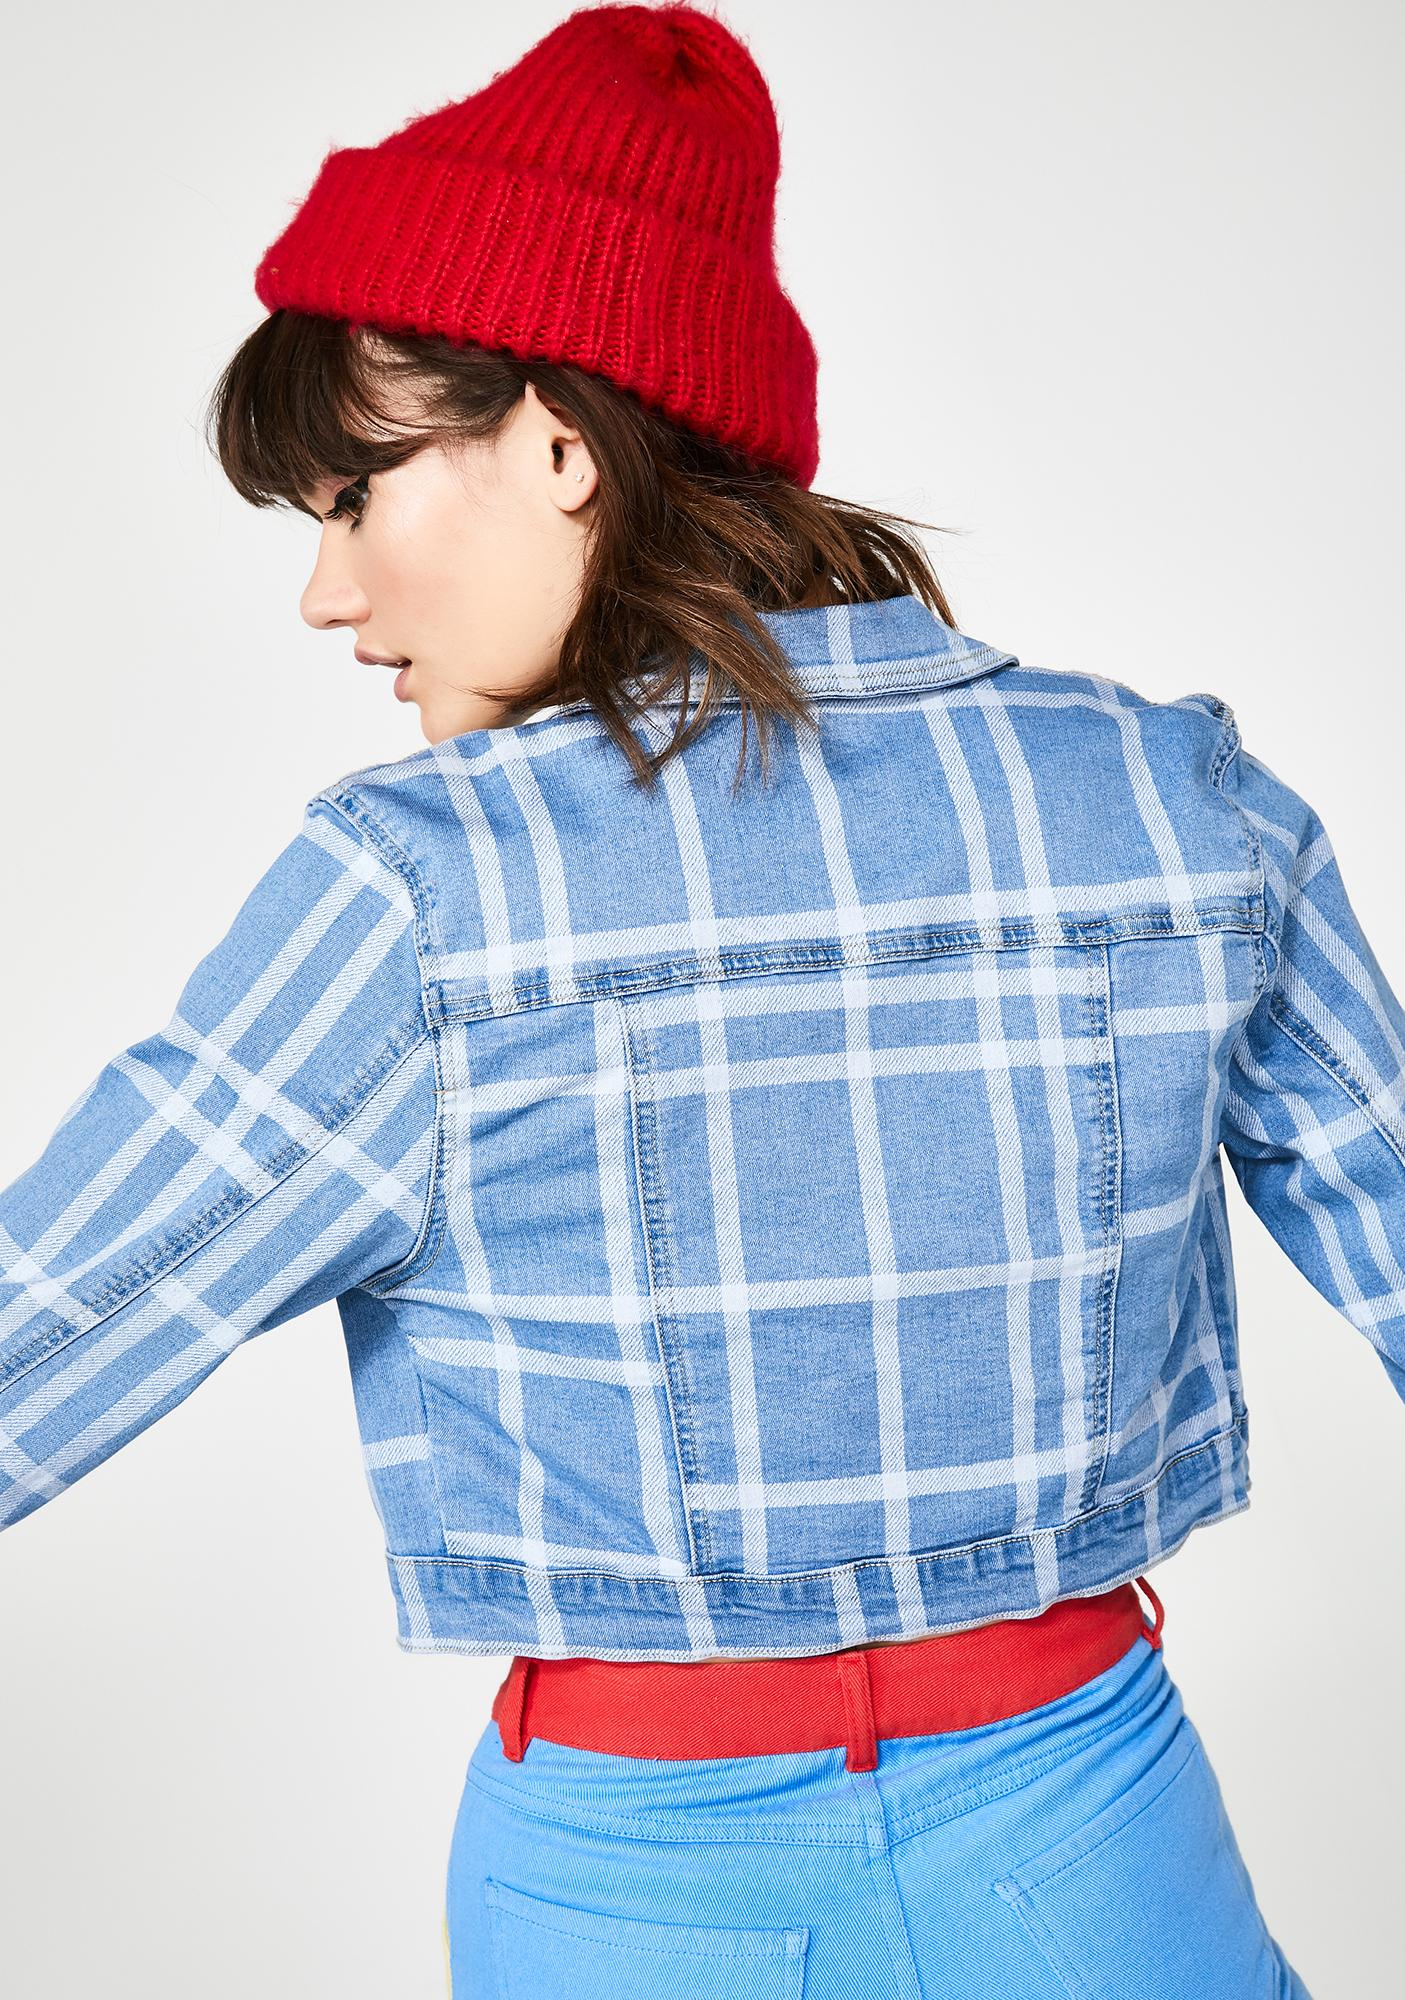 Jukebox Jammin' Denim Jacket